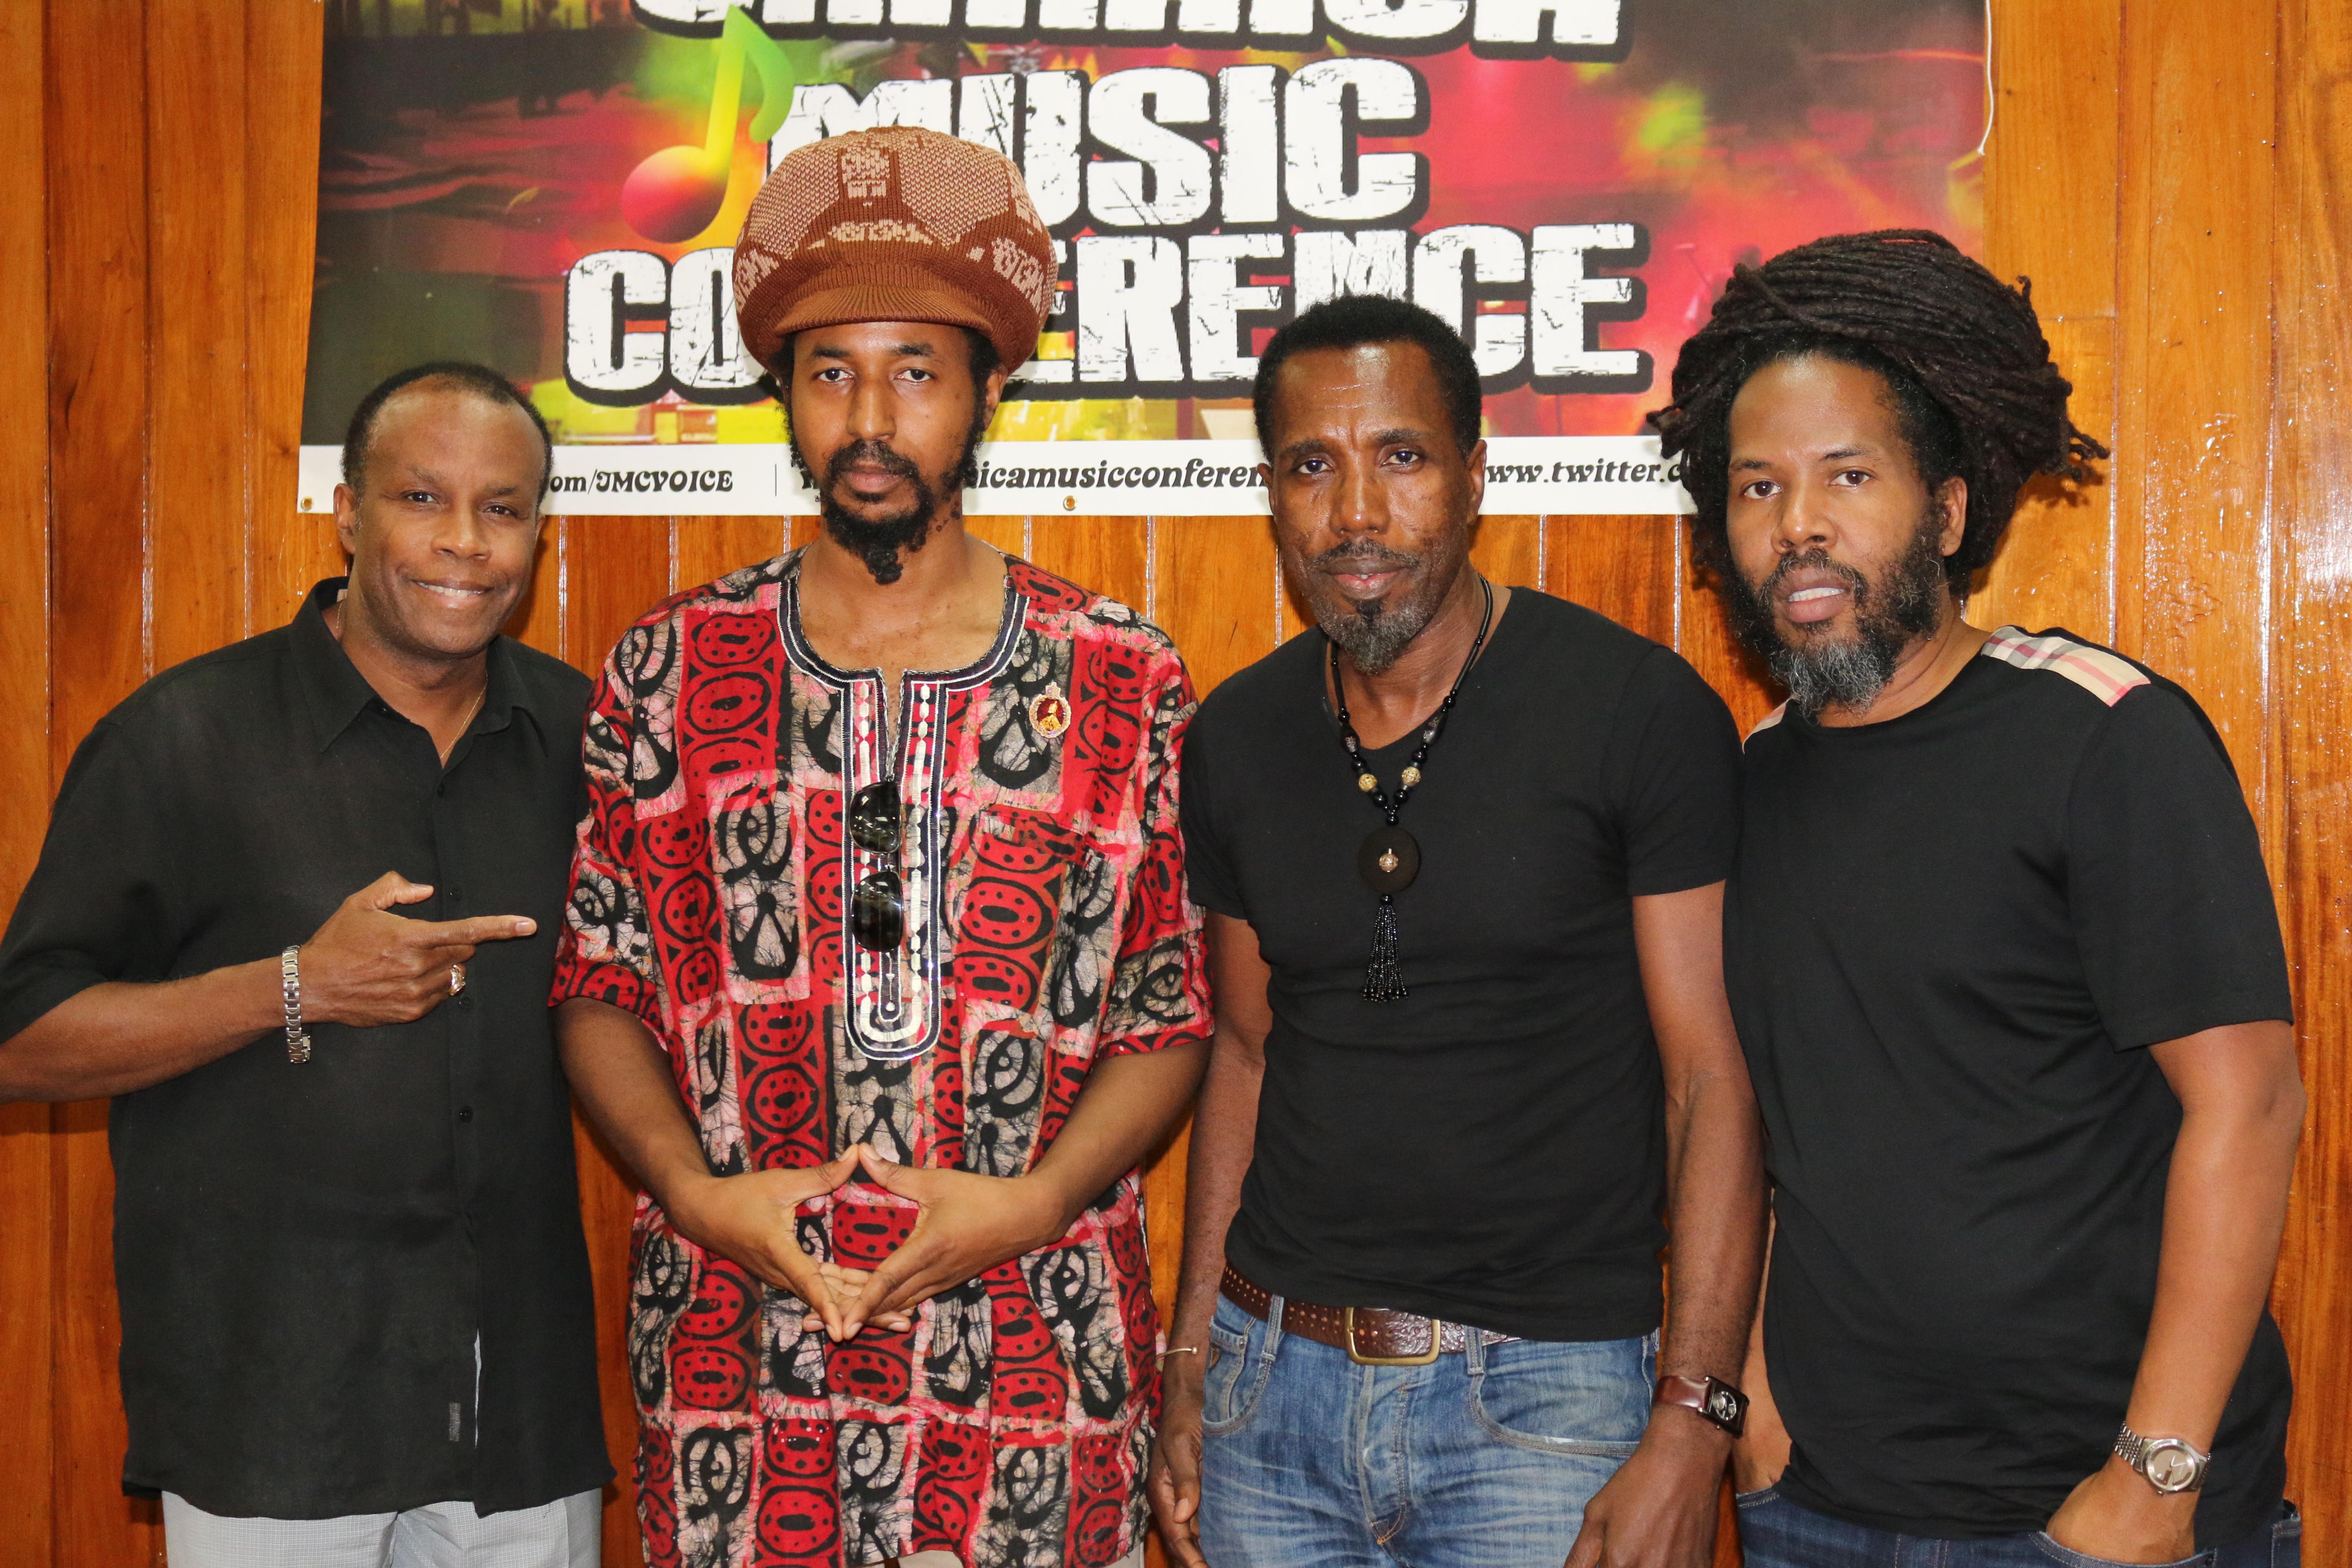 Jamaica Music Conference -Advancing Jamaica Through Music